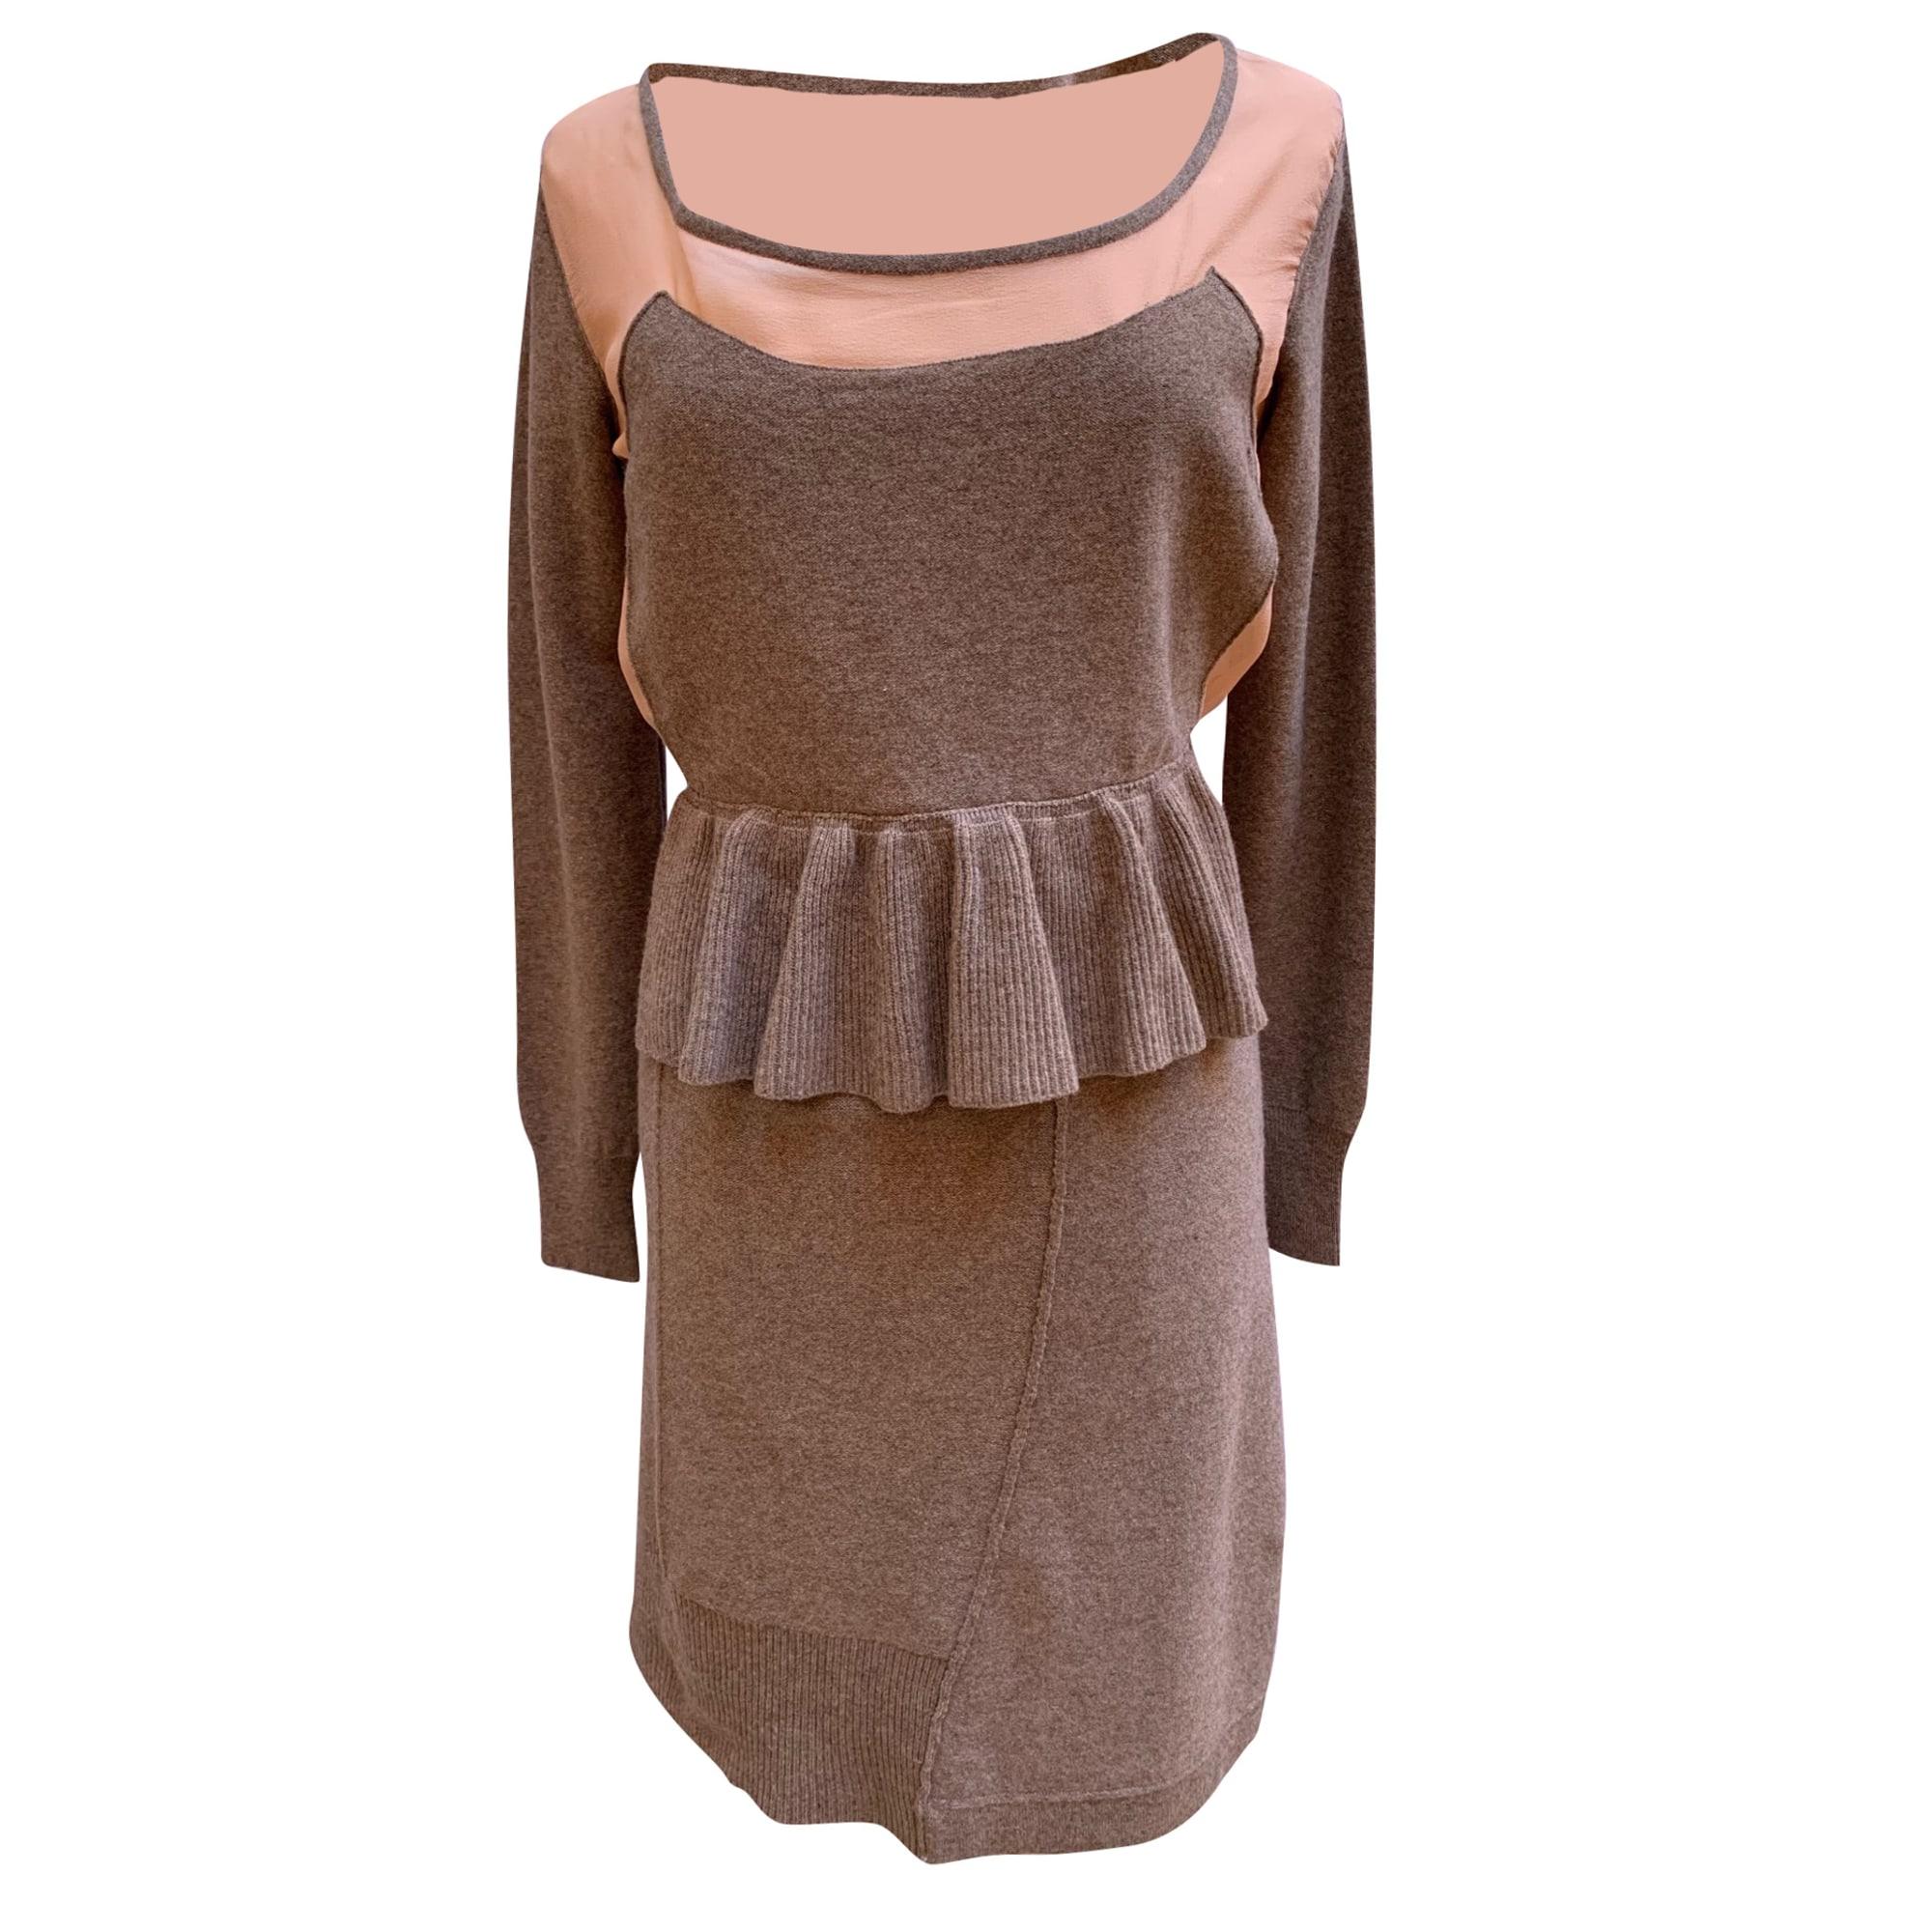 Robe courte SONIA RYKIEL Beige, camel